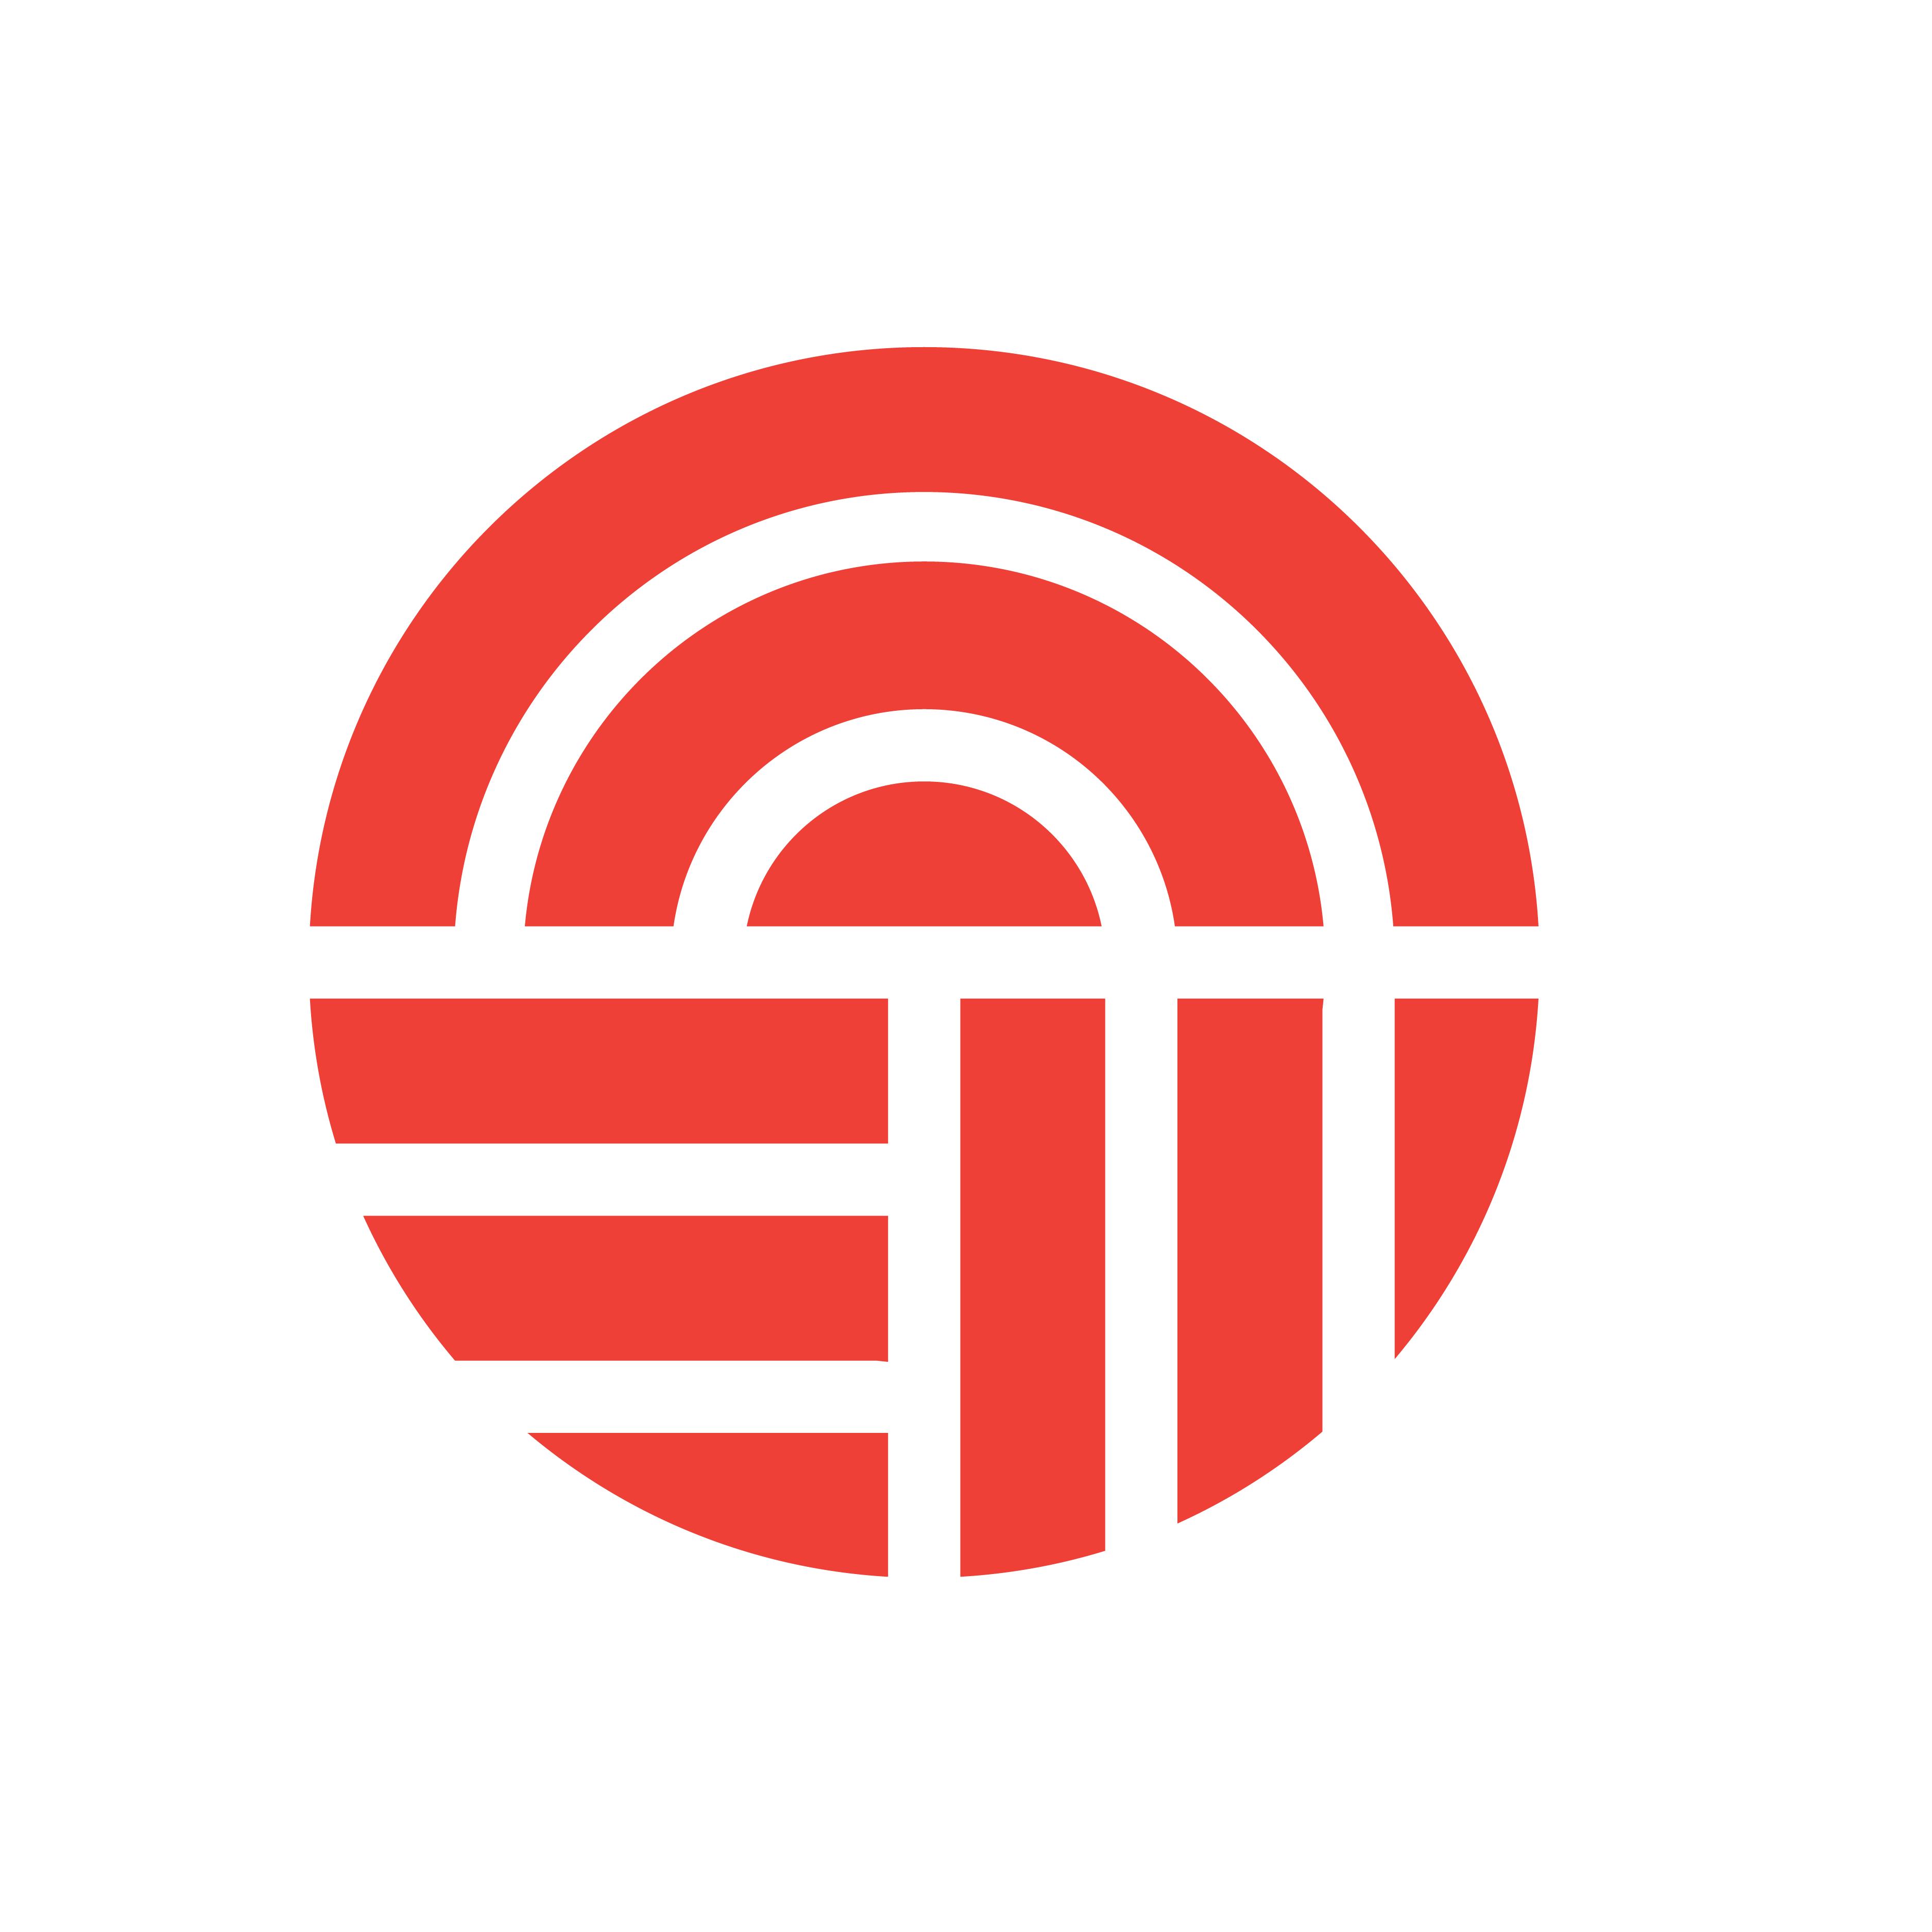 Gander Outdoors logo design by logo designer inkstache